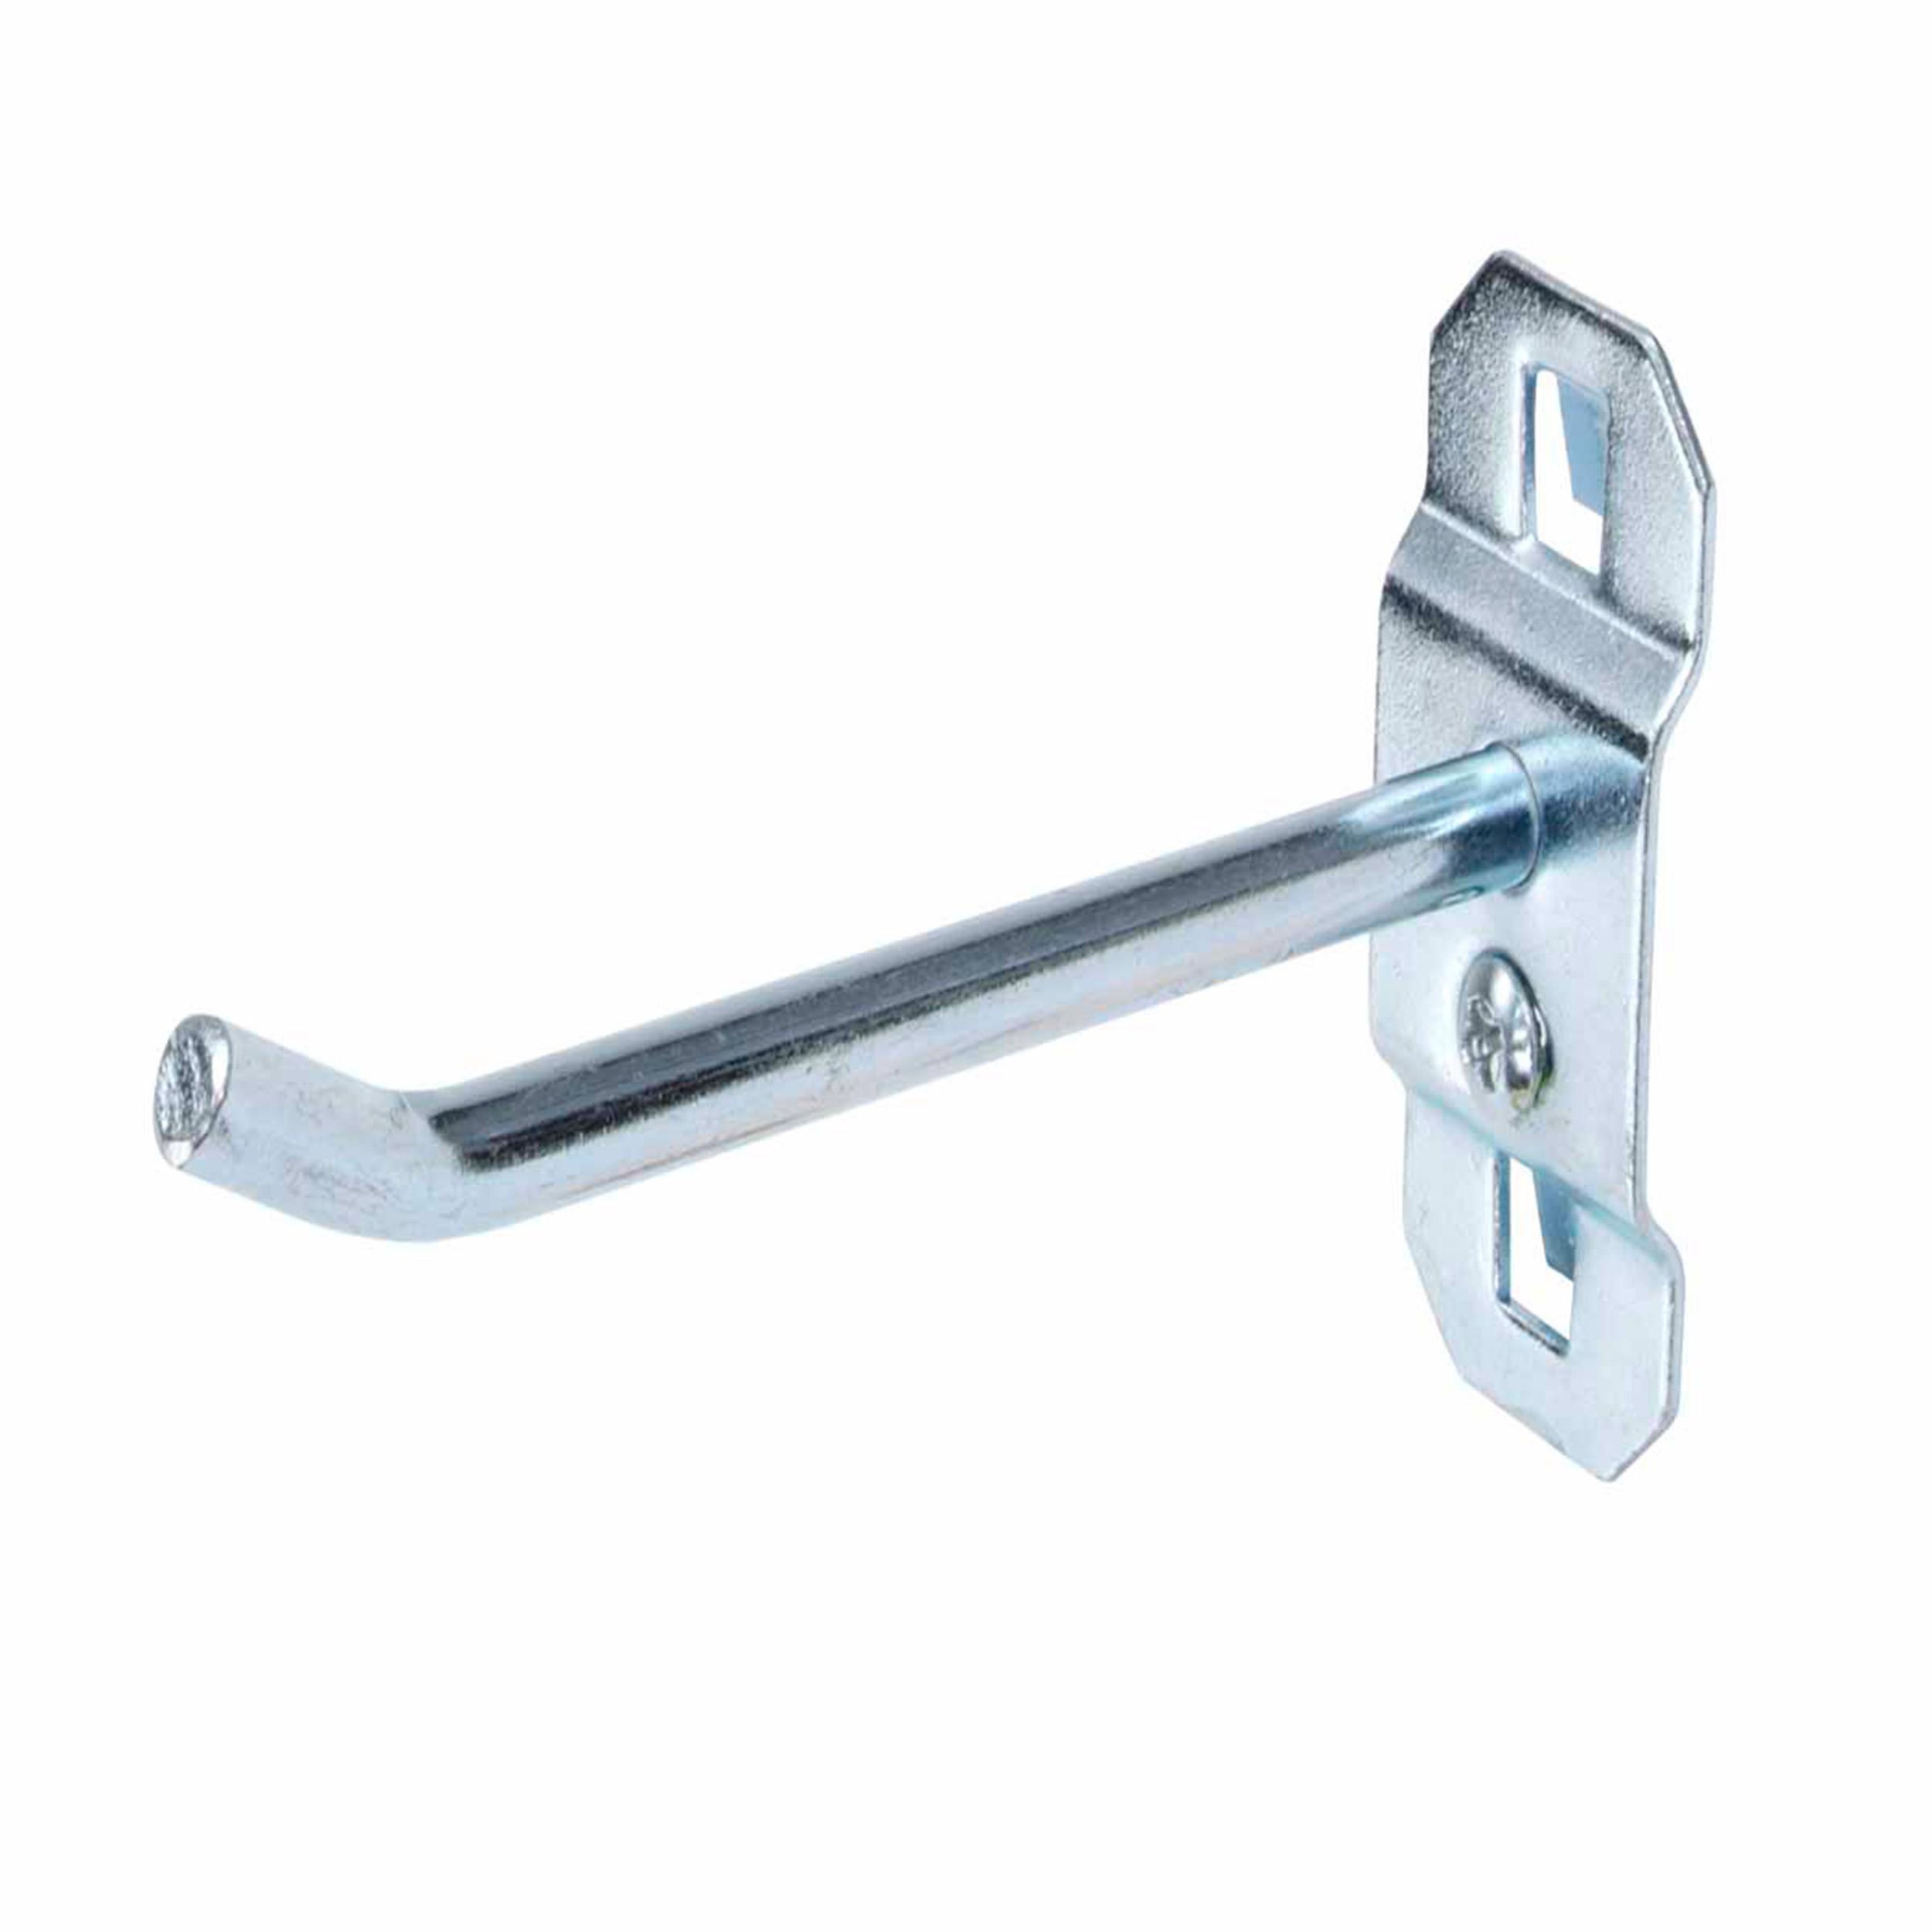 3 In. Single Rod 30 Degree Bend 1/4 In. Dia. Zinc Plated Steel Pegboard Hook for LocBoard, 5 Pack